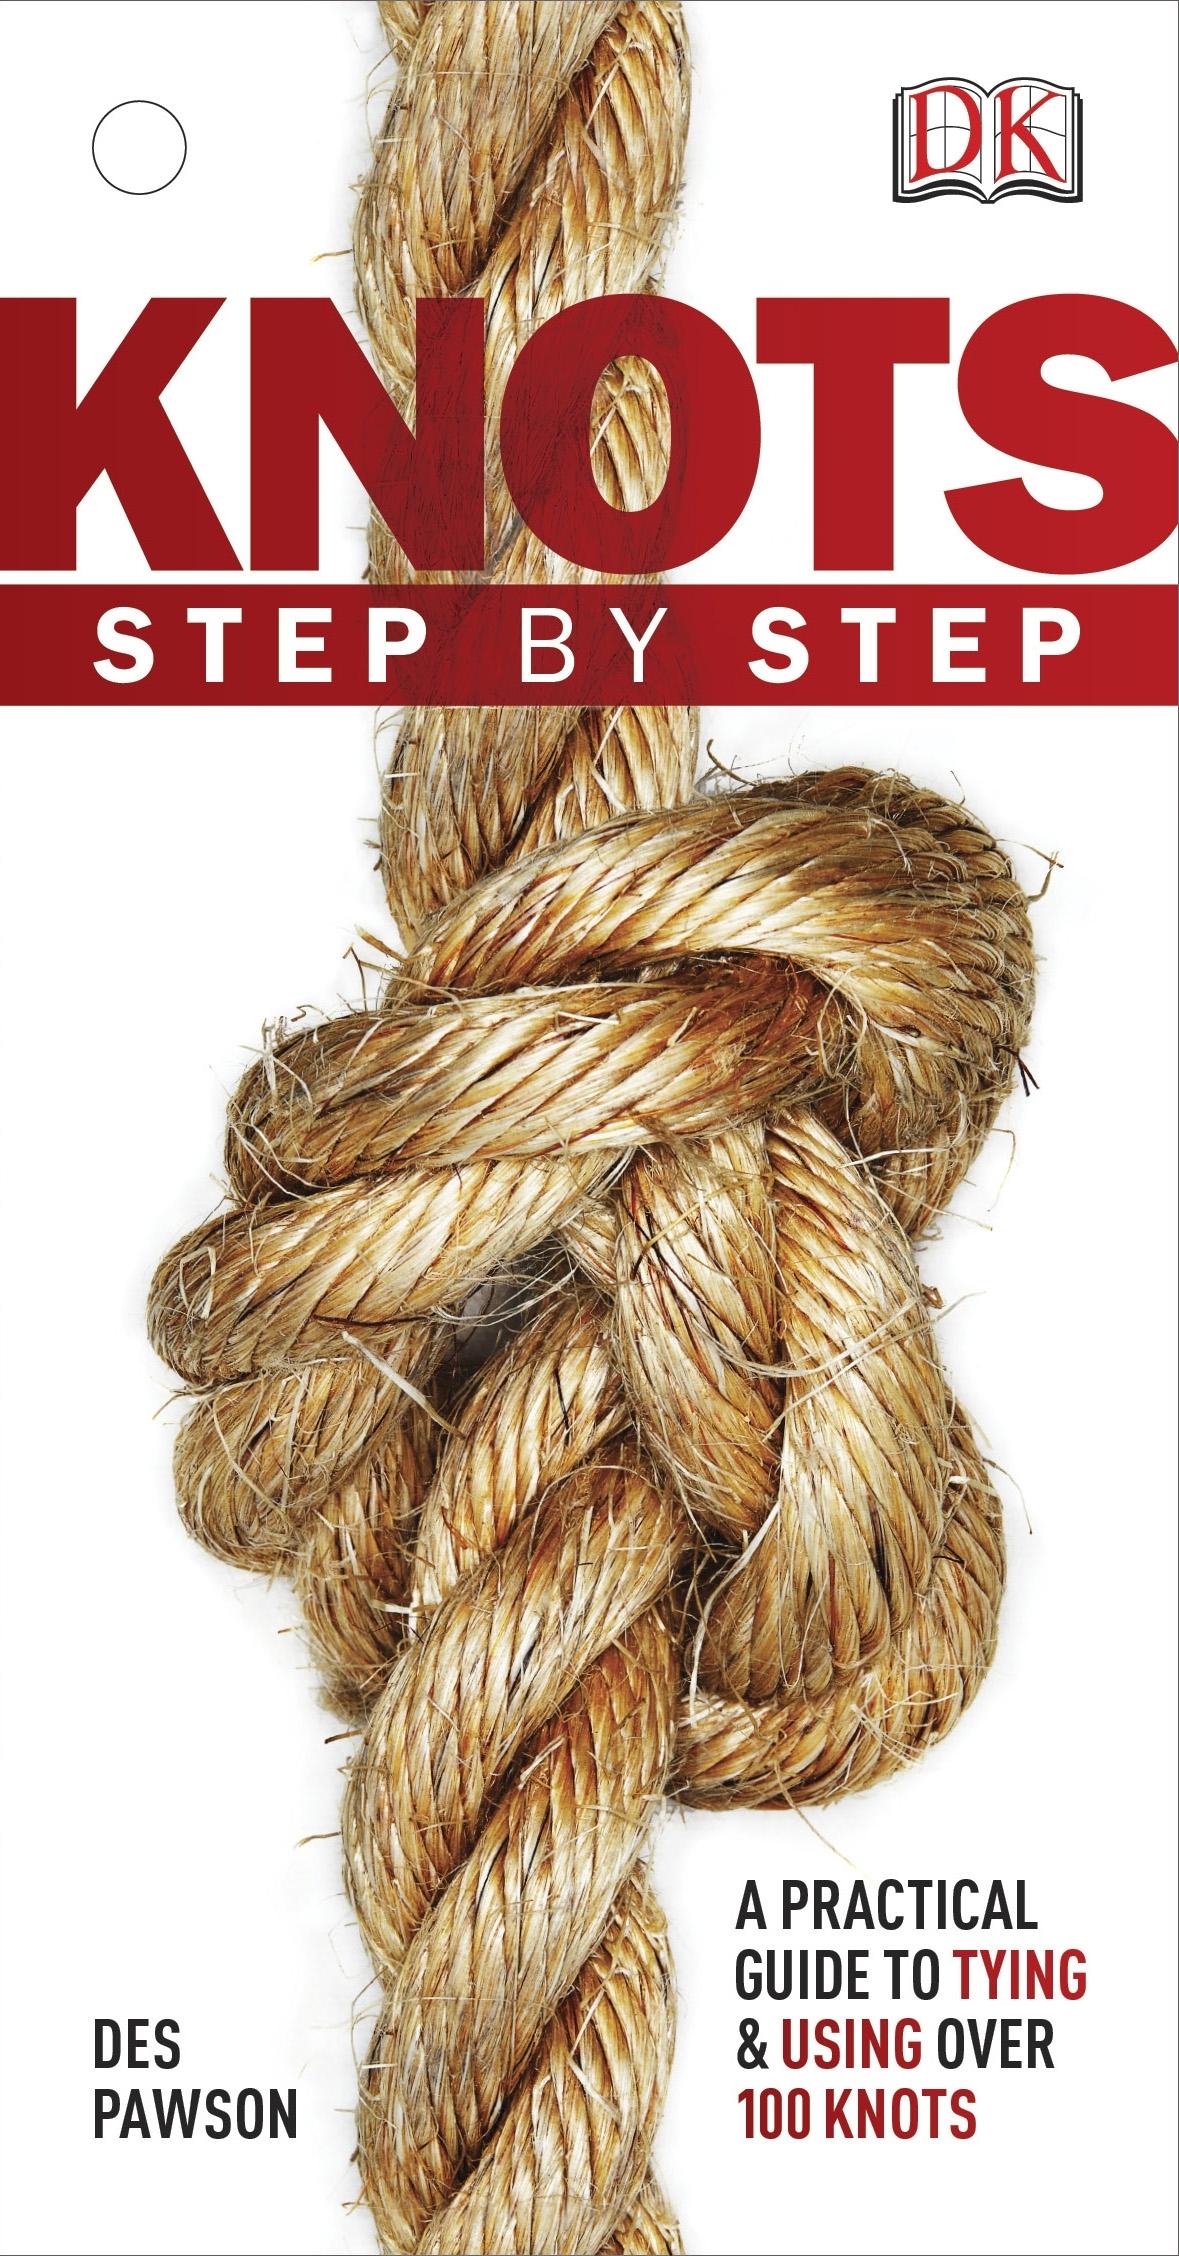 Knots Step By Step | Penguin Books Australia